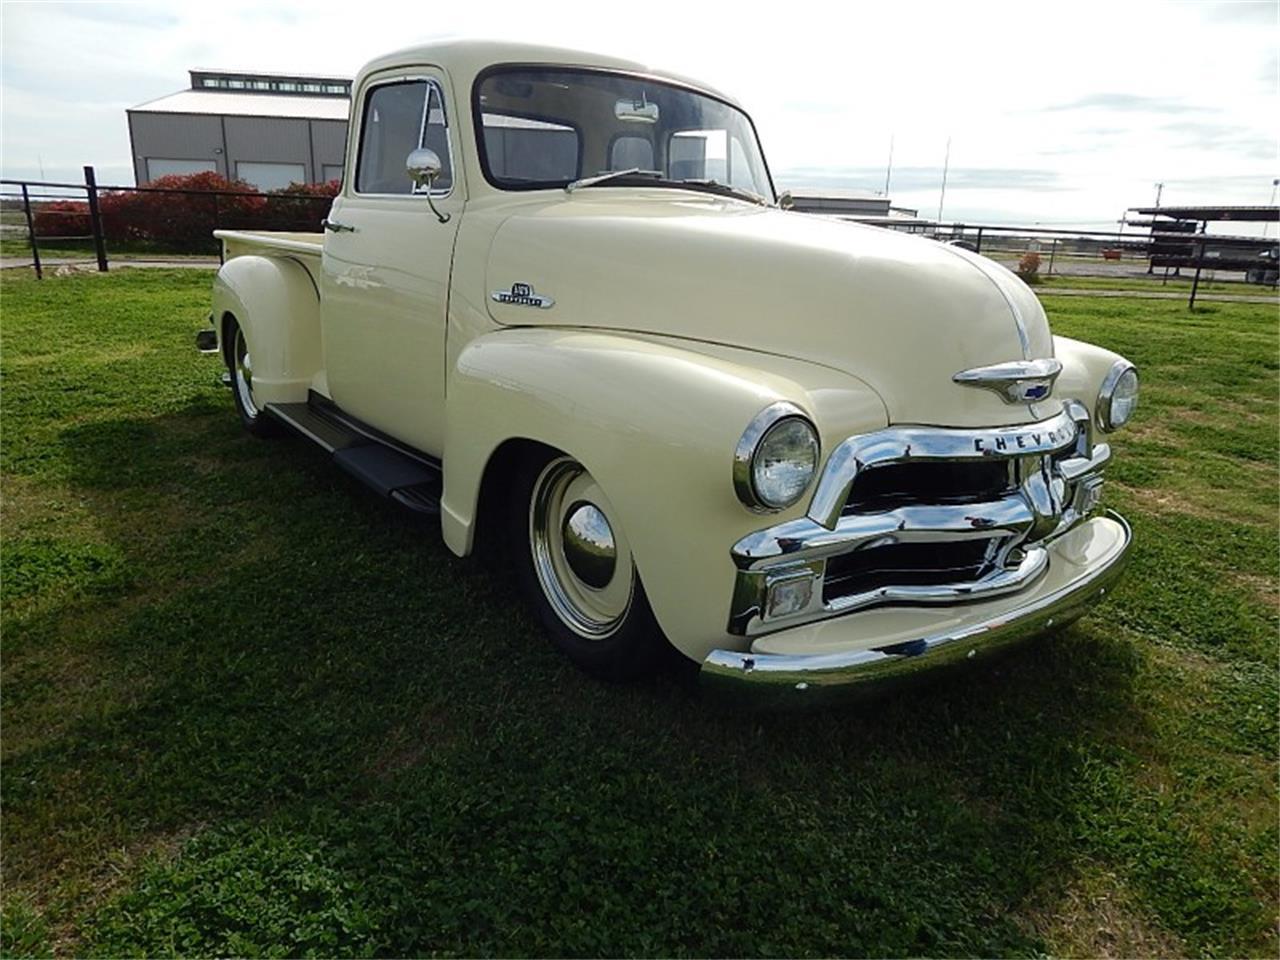 1955 Chevrolet Pickup for sale in Wichita Falls, TX ...